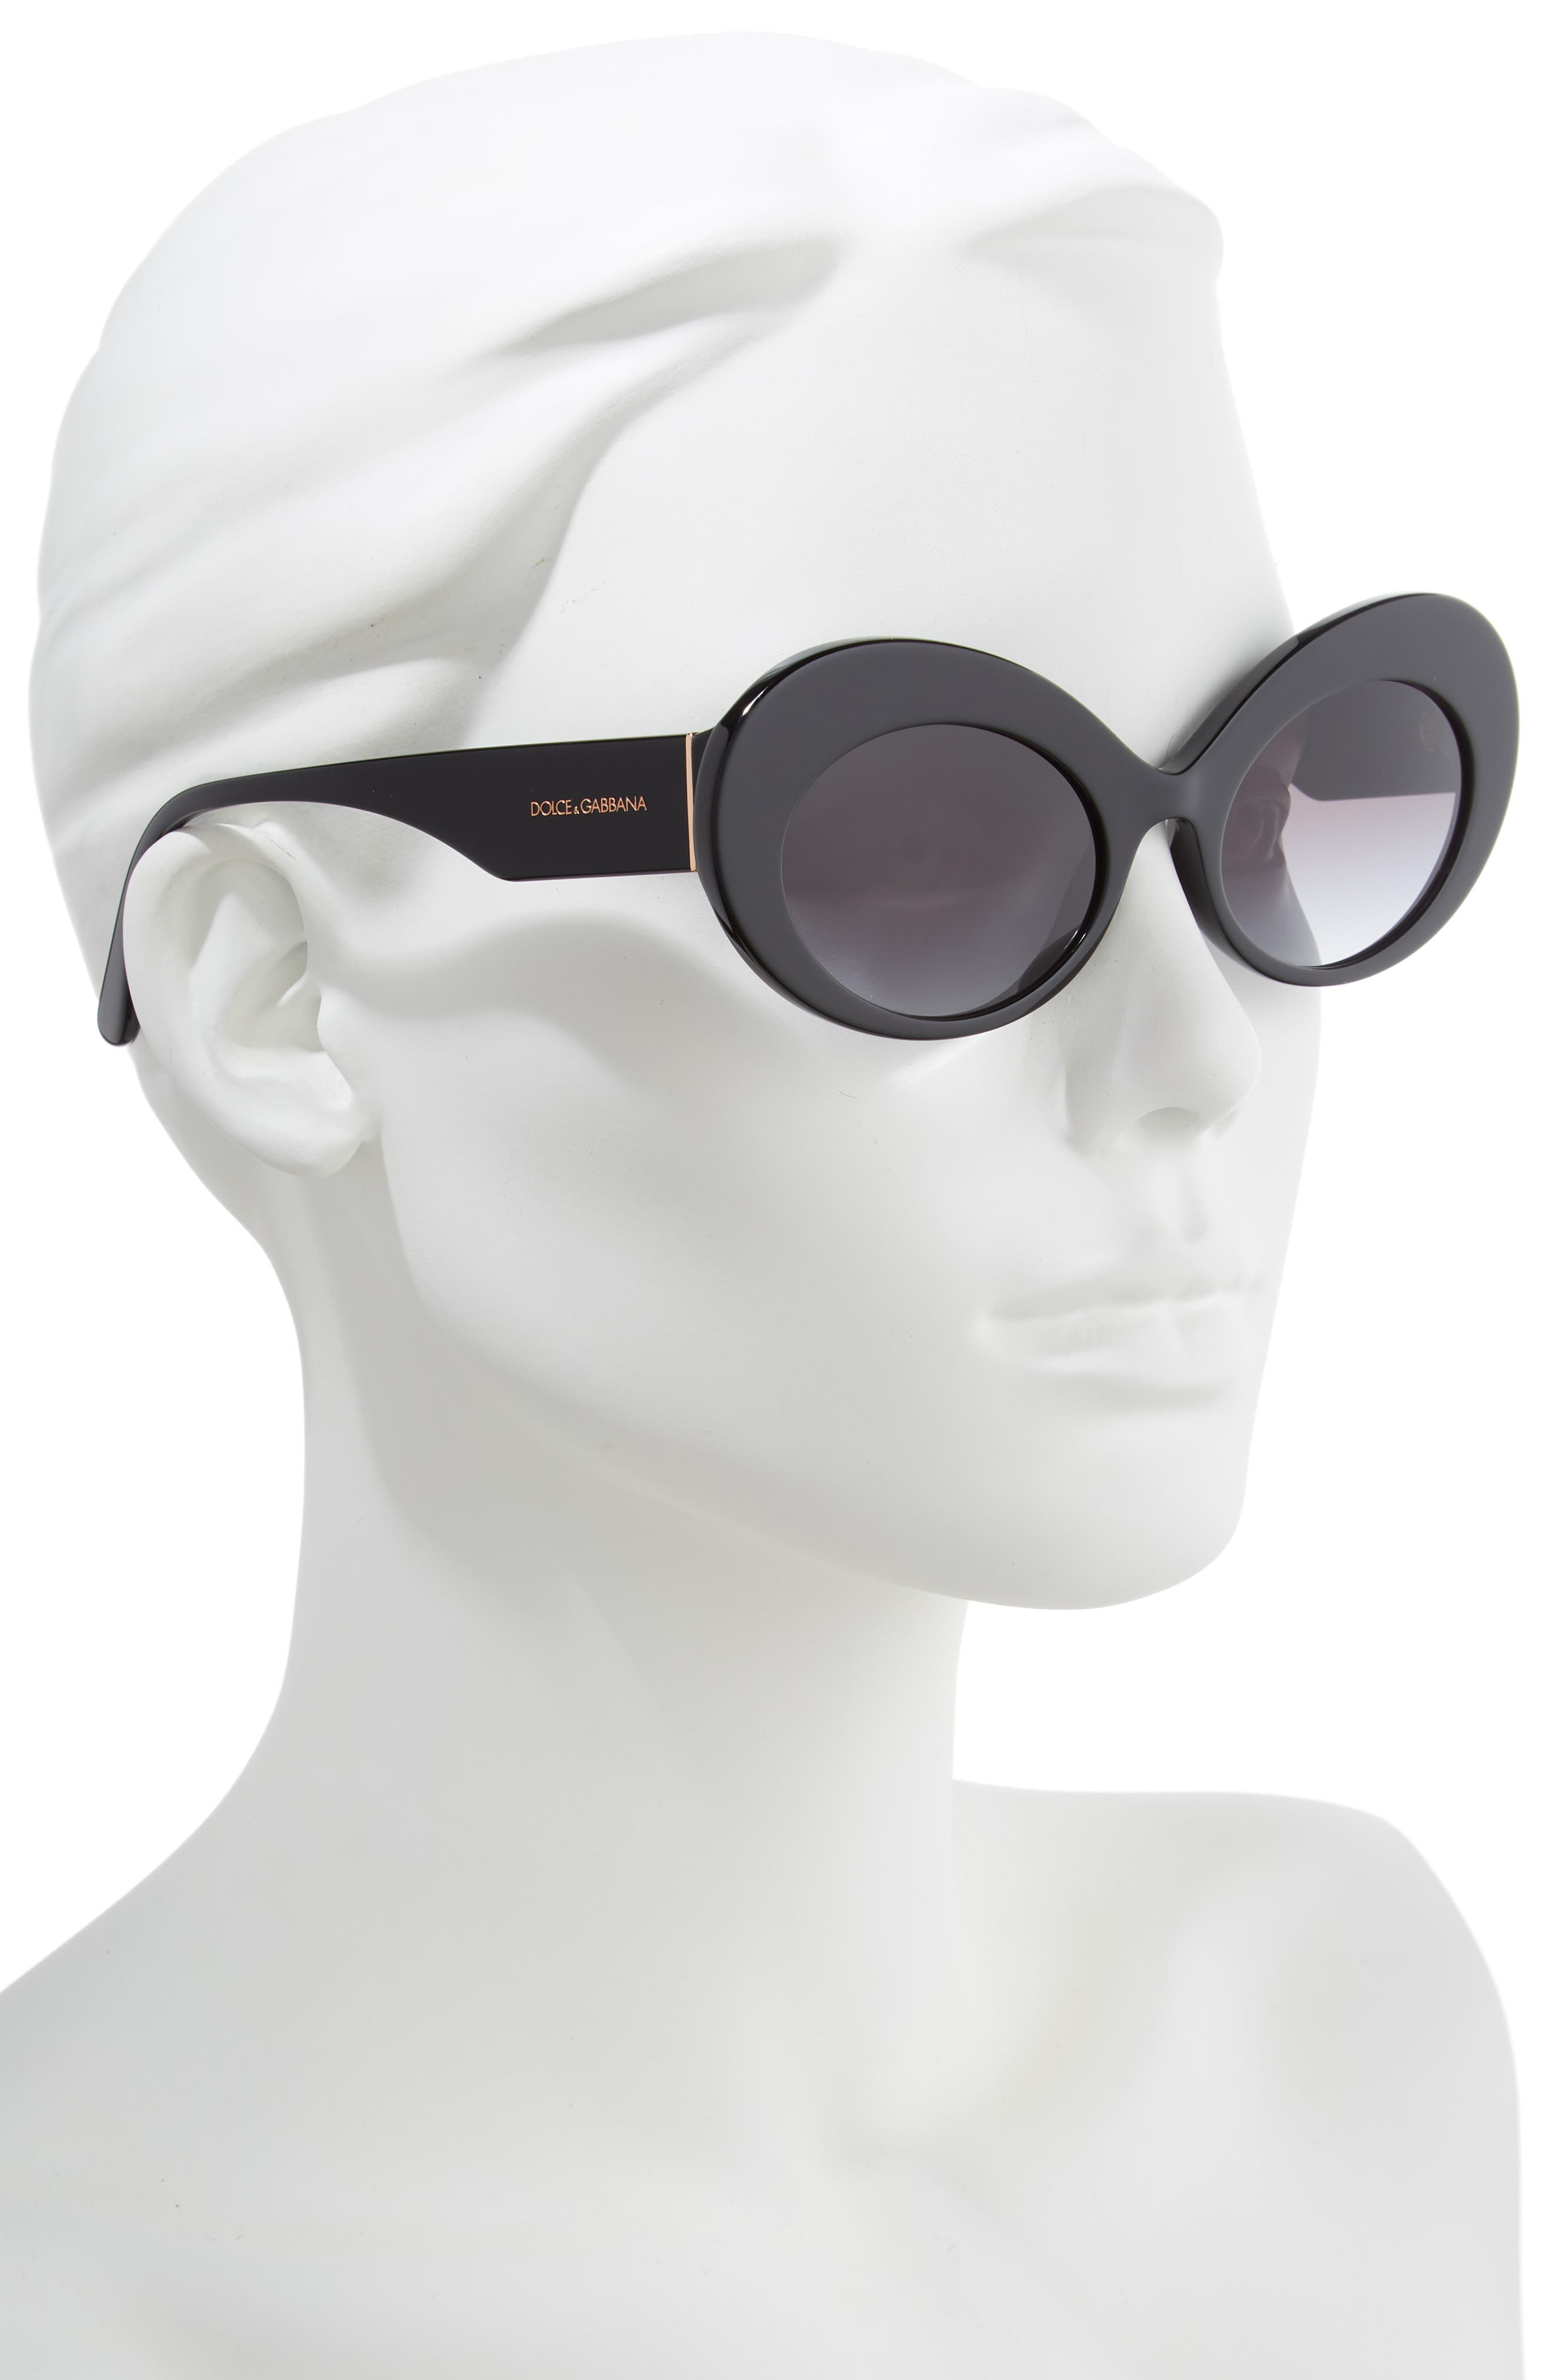 aaf7055b337 dolce and gabbana sun glasses